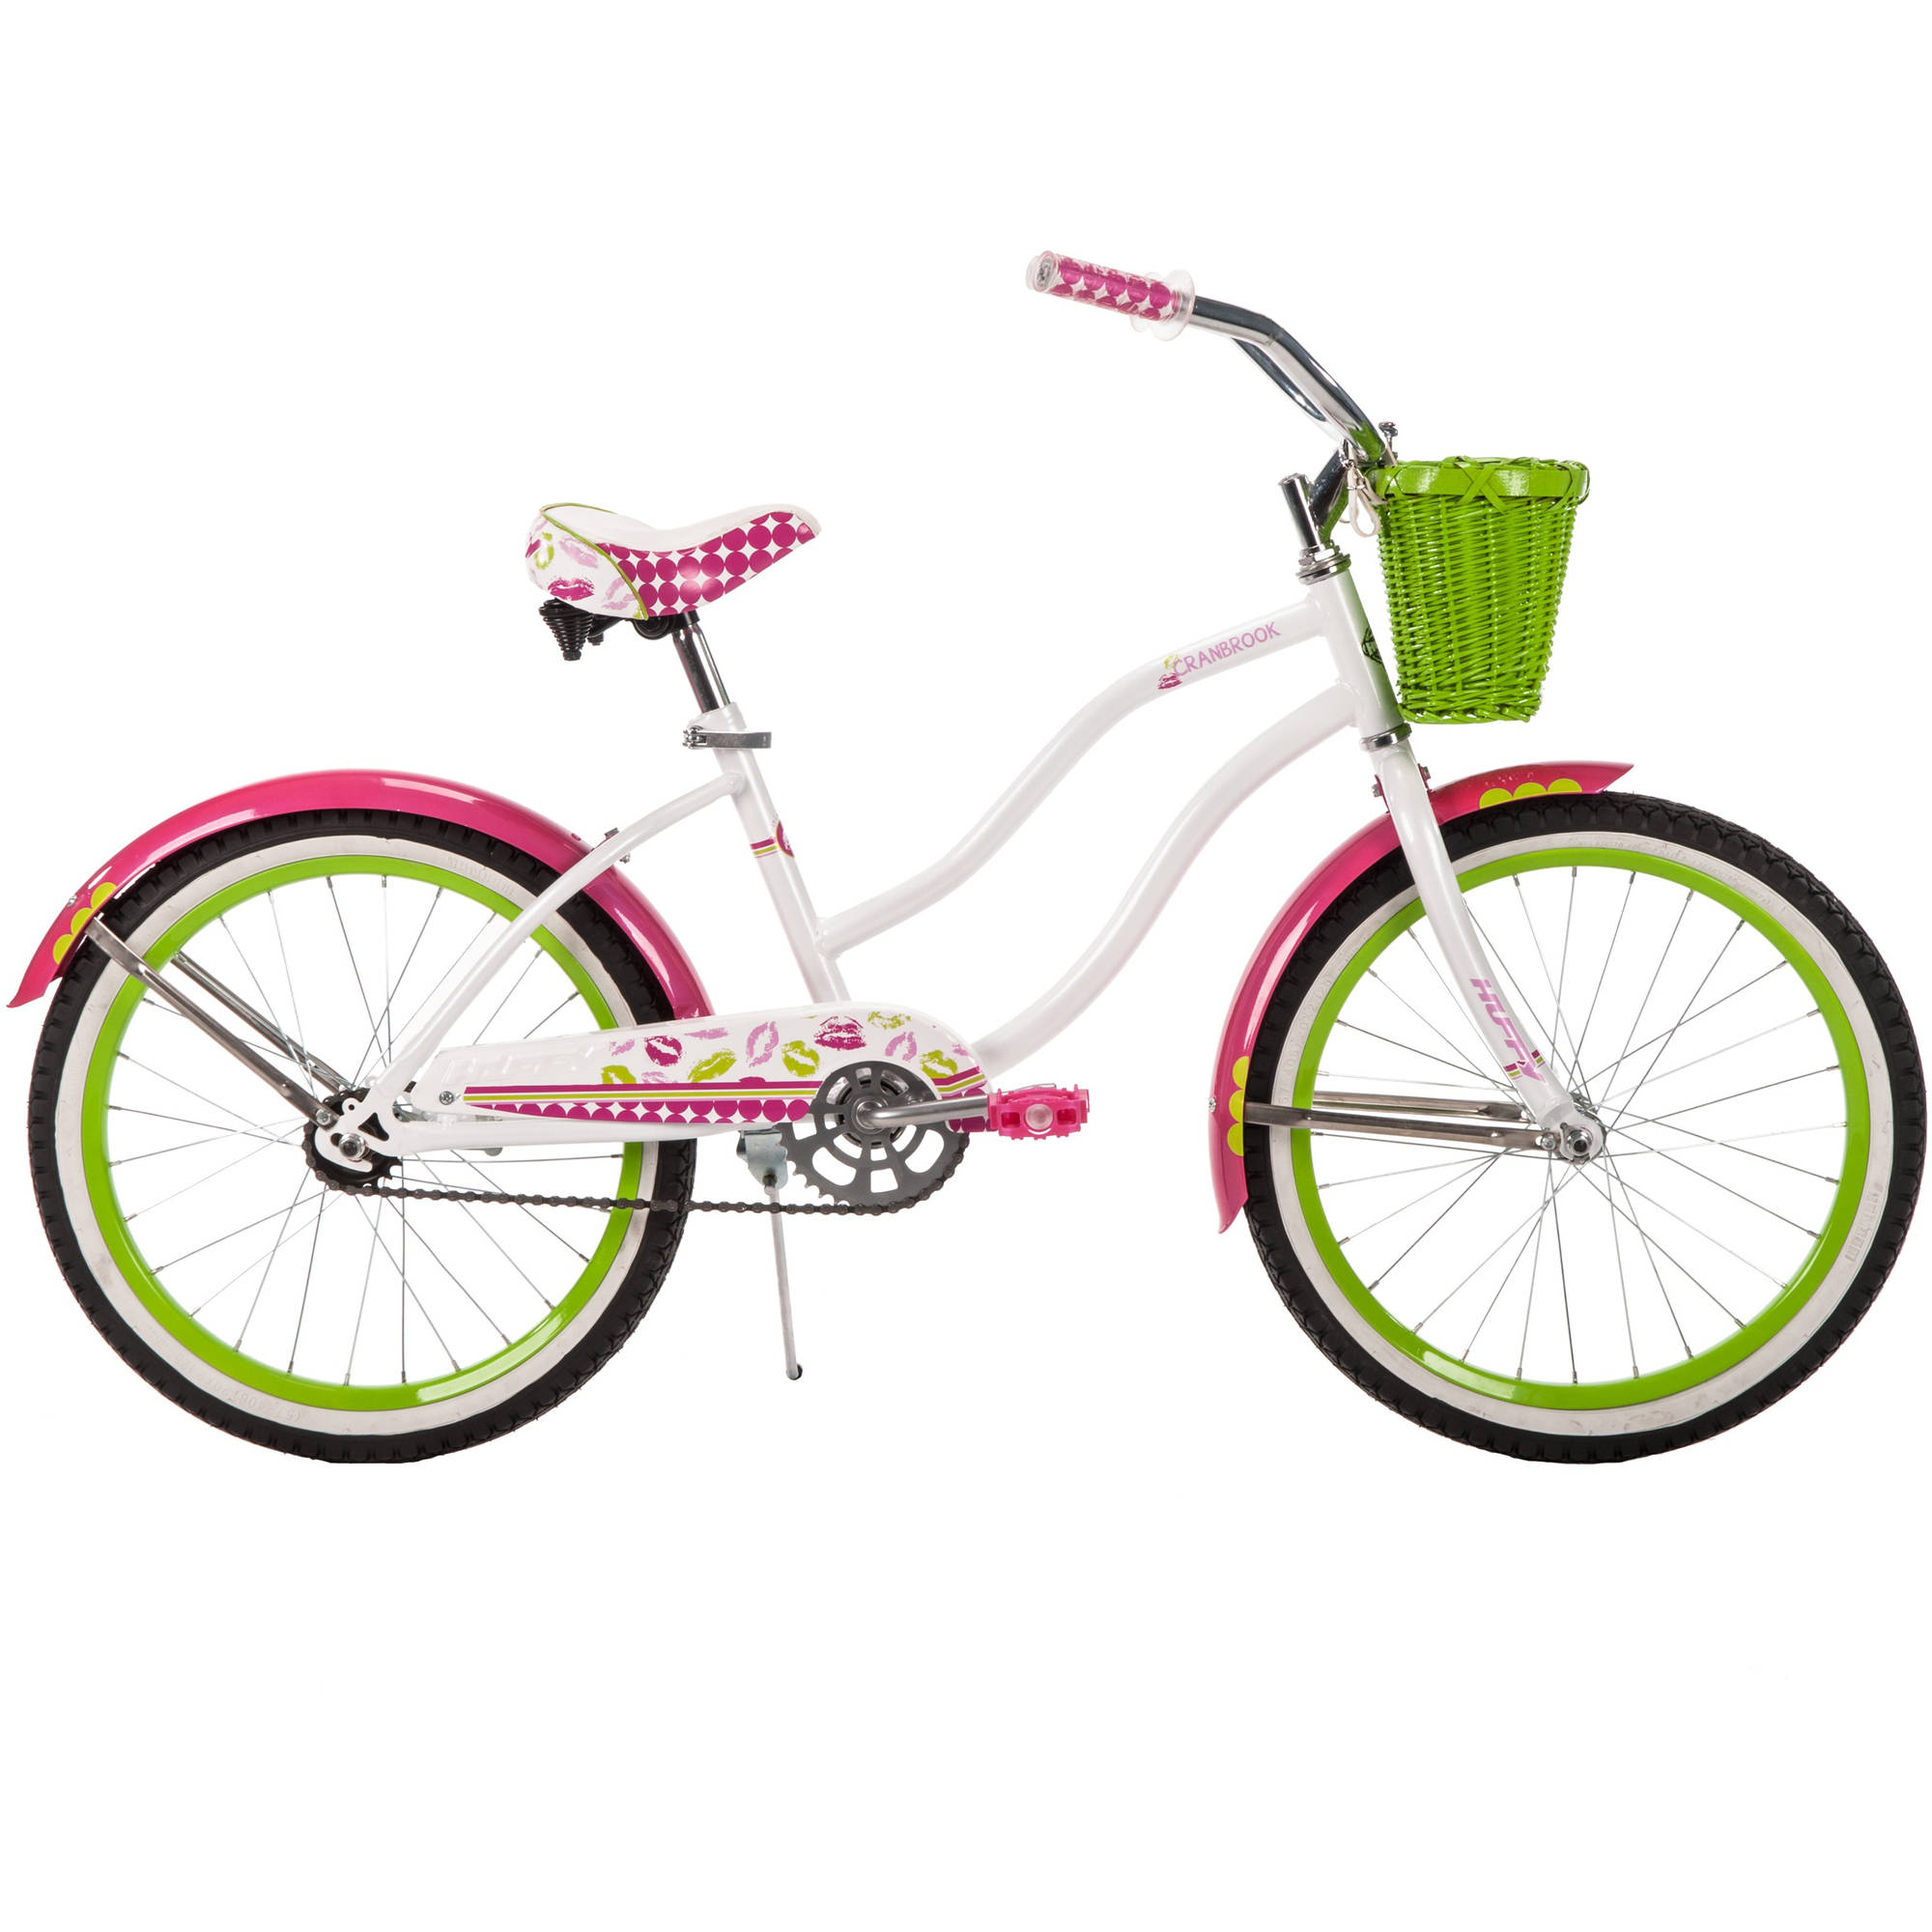 "20"" Huffy Girls' Cranbrook Cruiser Bike, White, Wicker Basket"